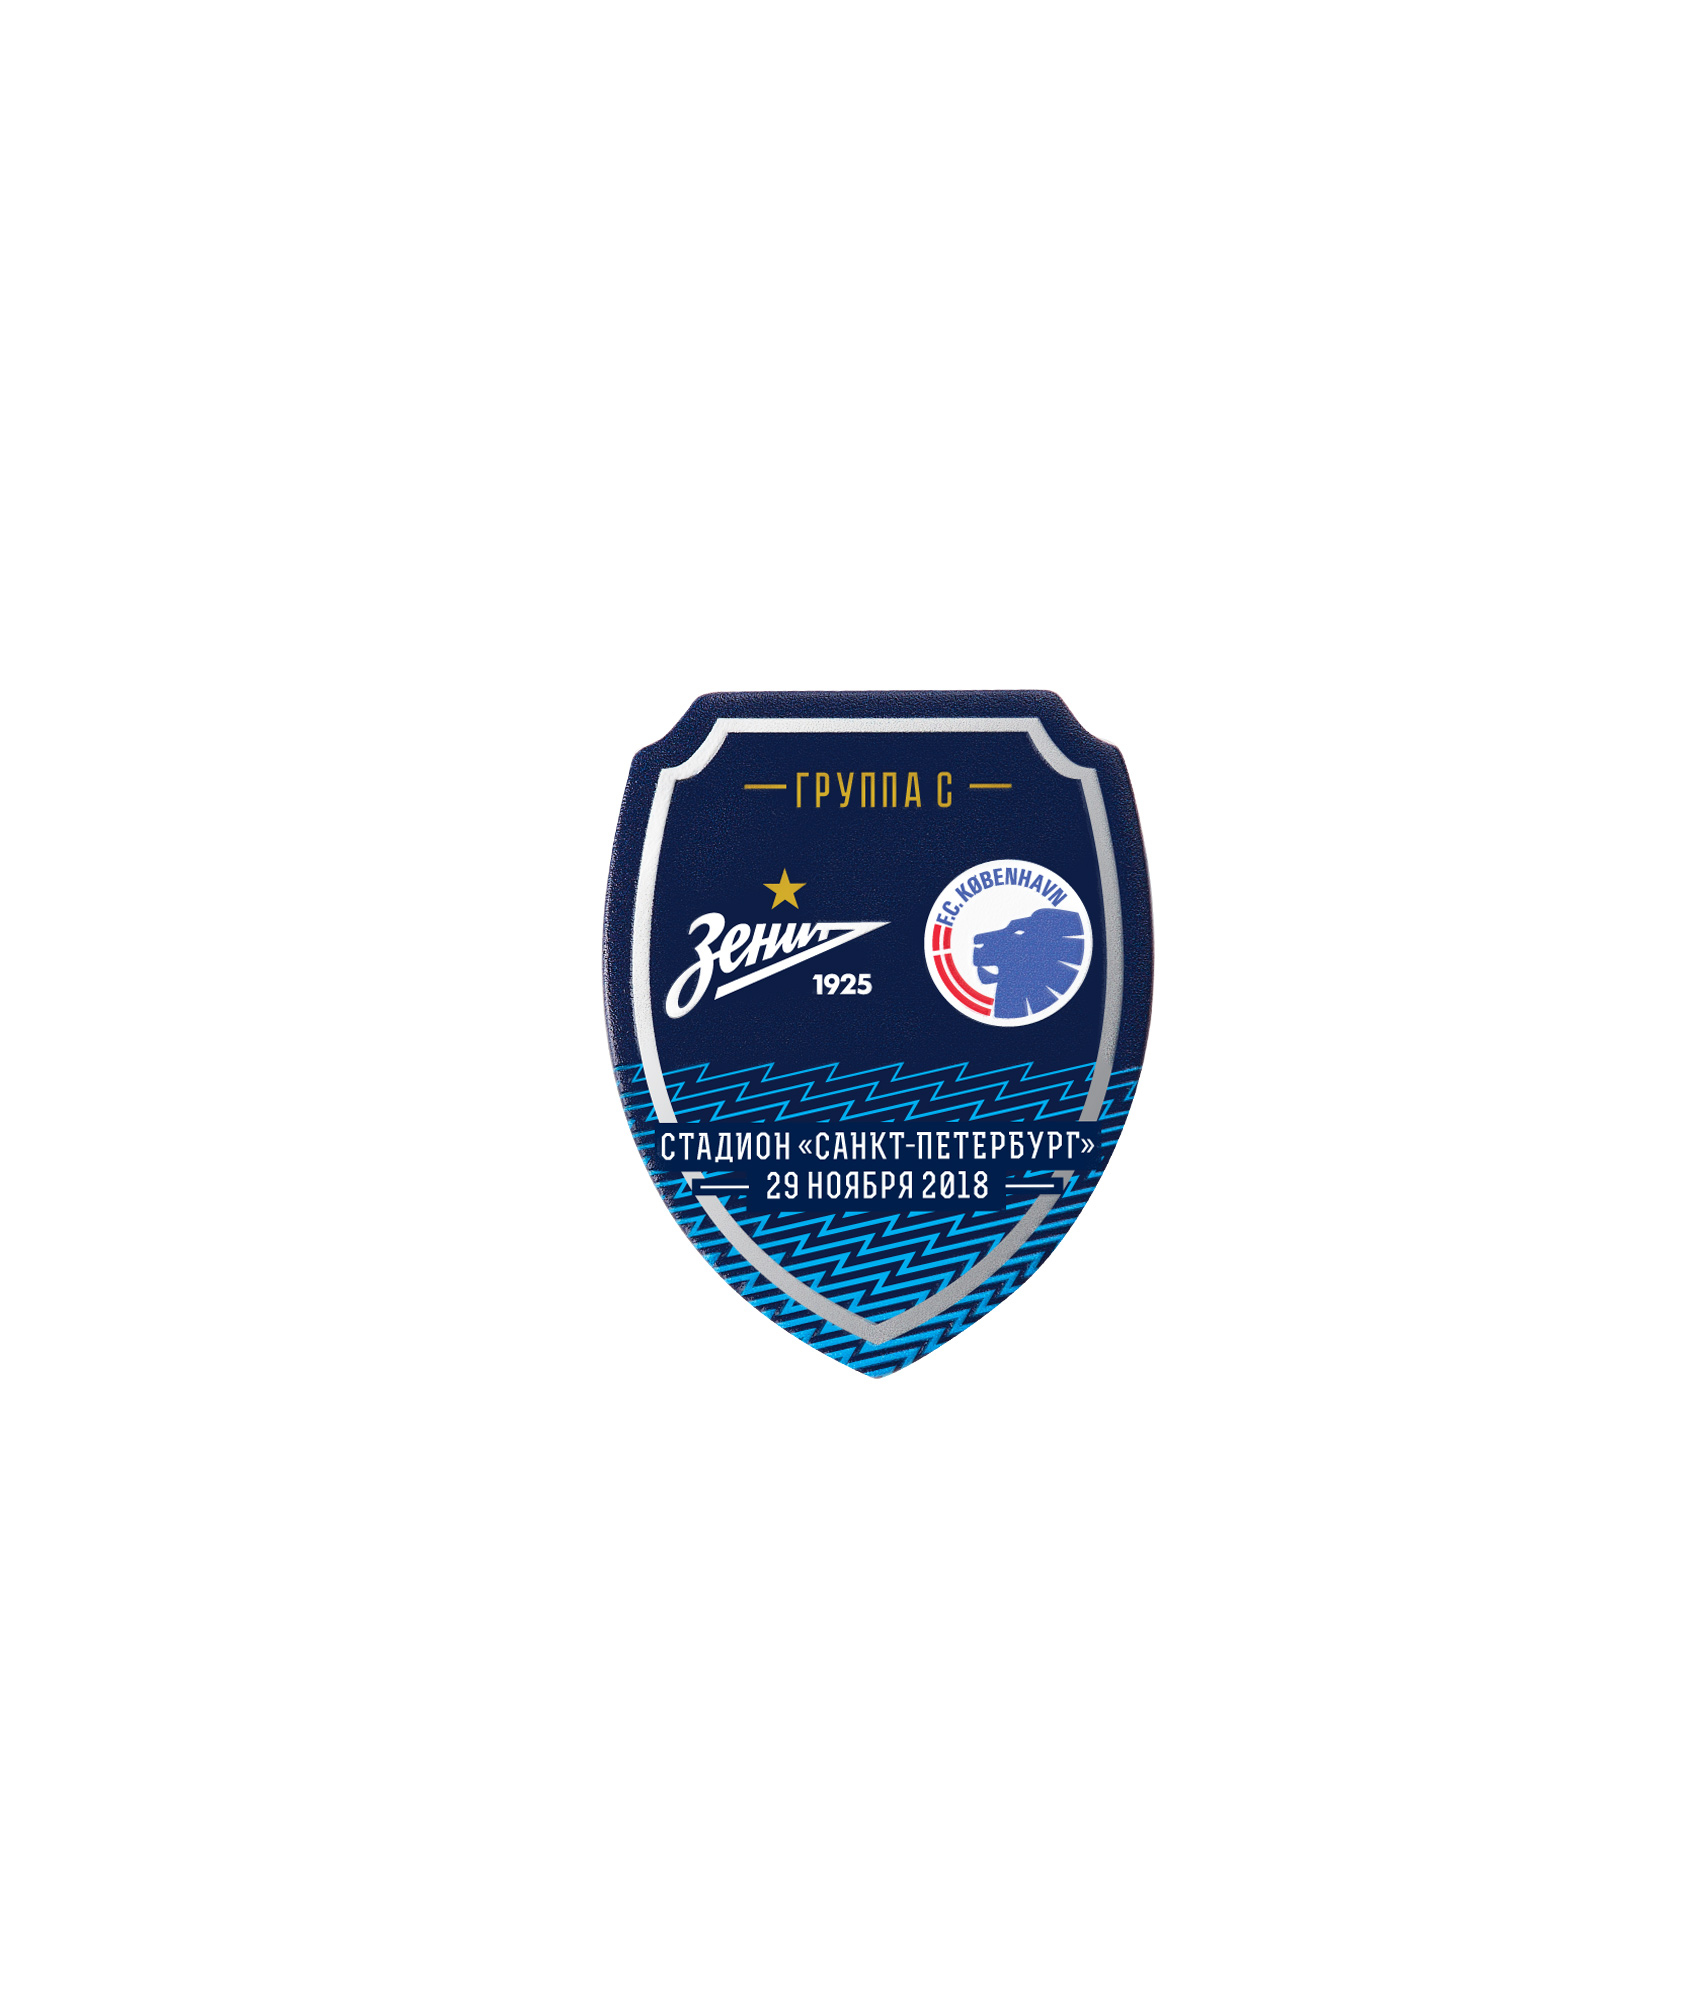 Значок матчевый «Зенит-Копенгаген» 29.11.2018 Зенит значок наше имя зенит зенит